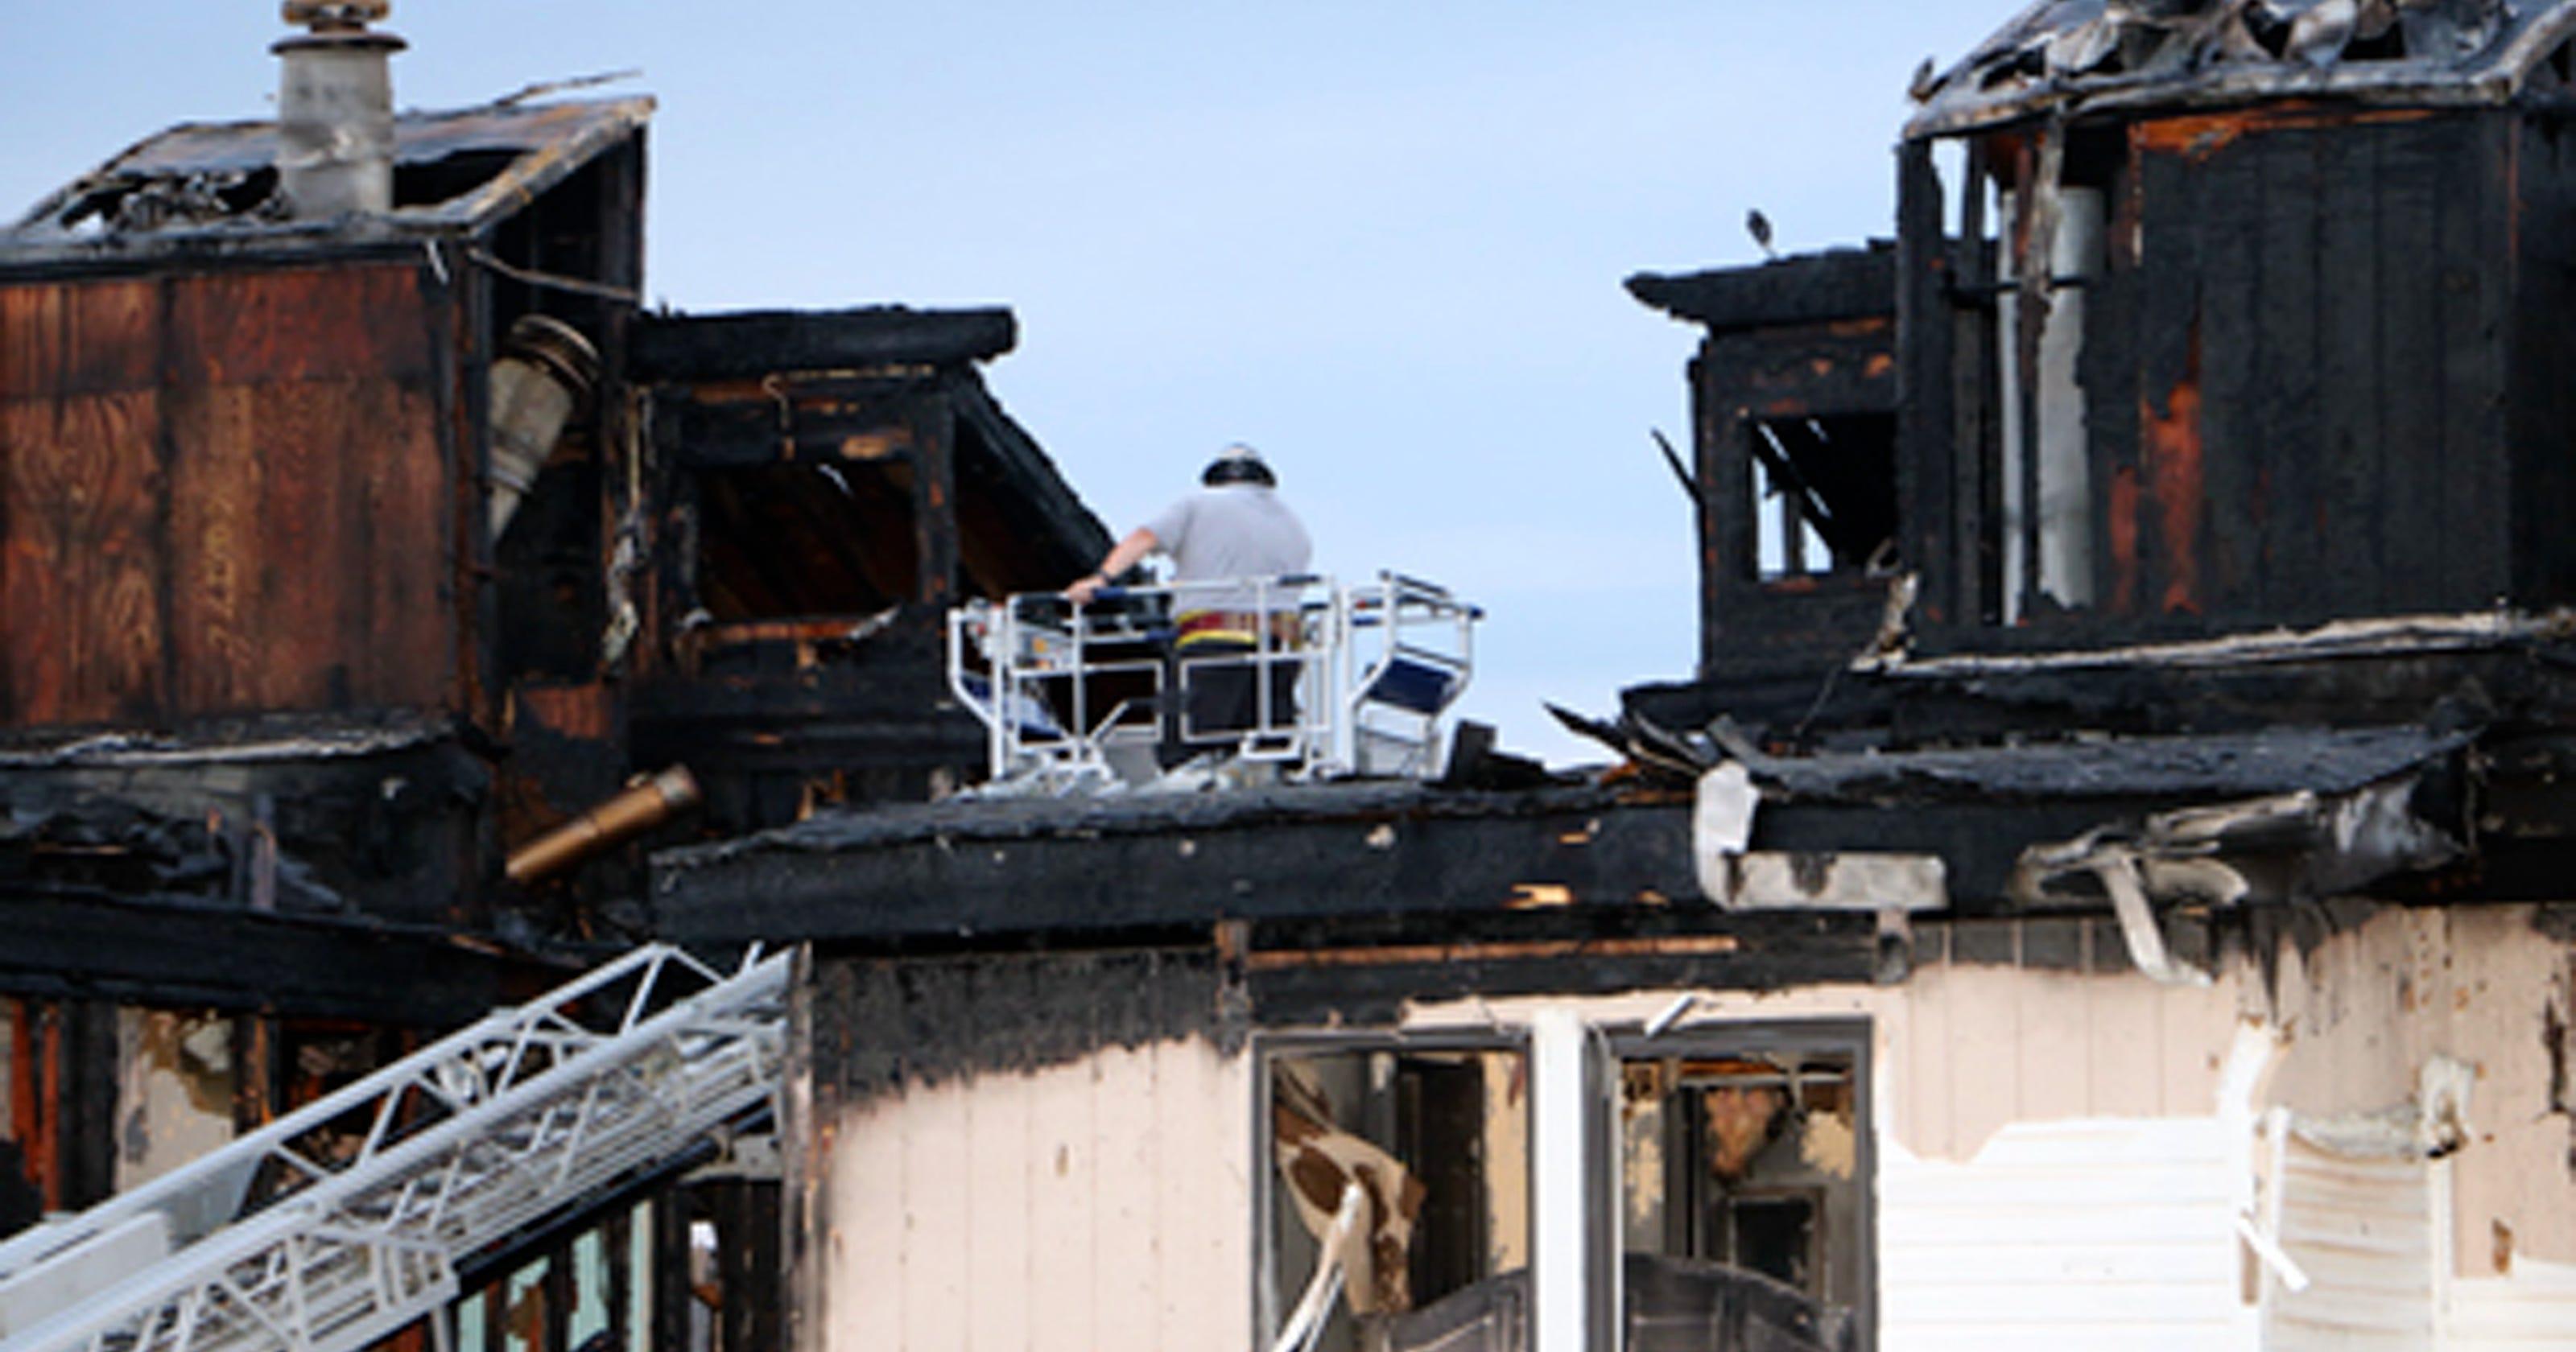 Osage Beach condo fire kills 4 young kids celebrating birthday